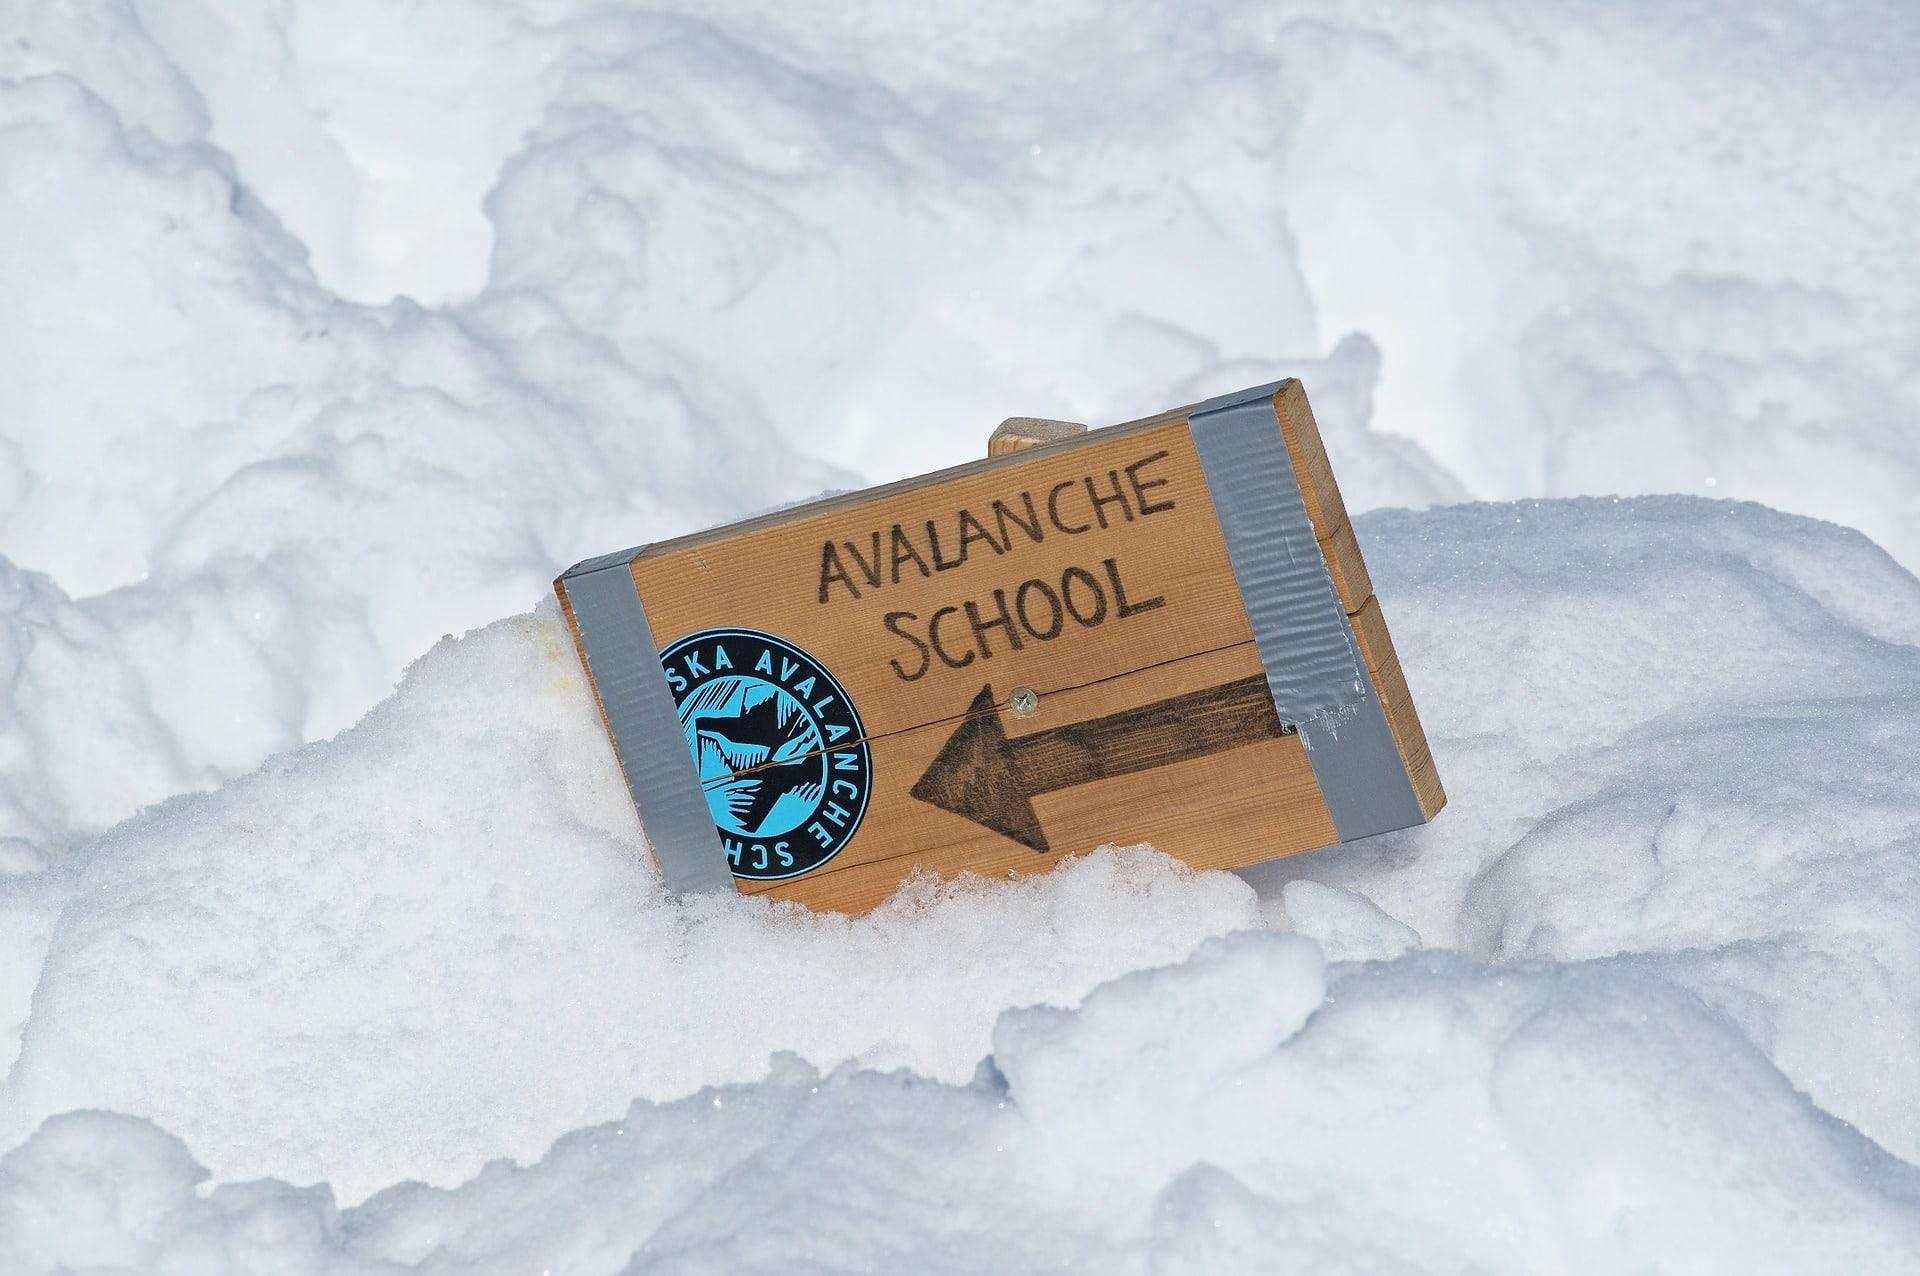 avalanche school snow pixabay